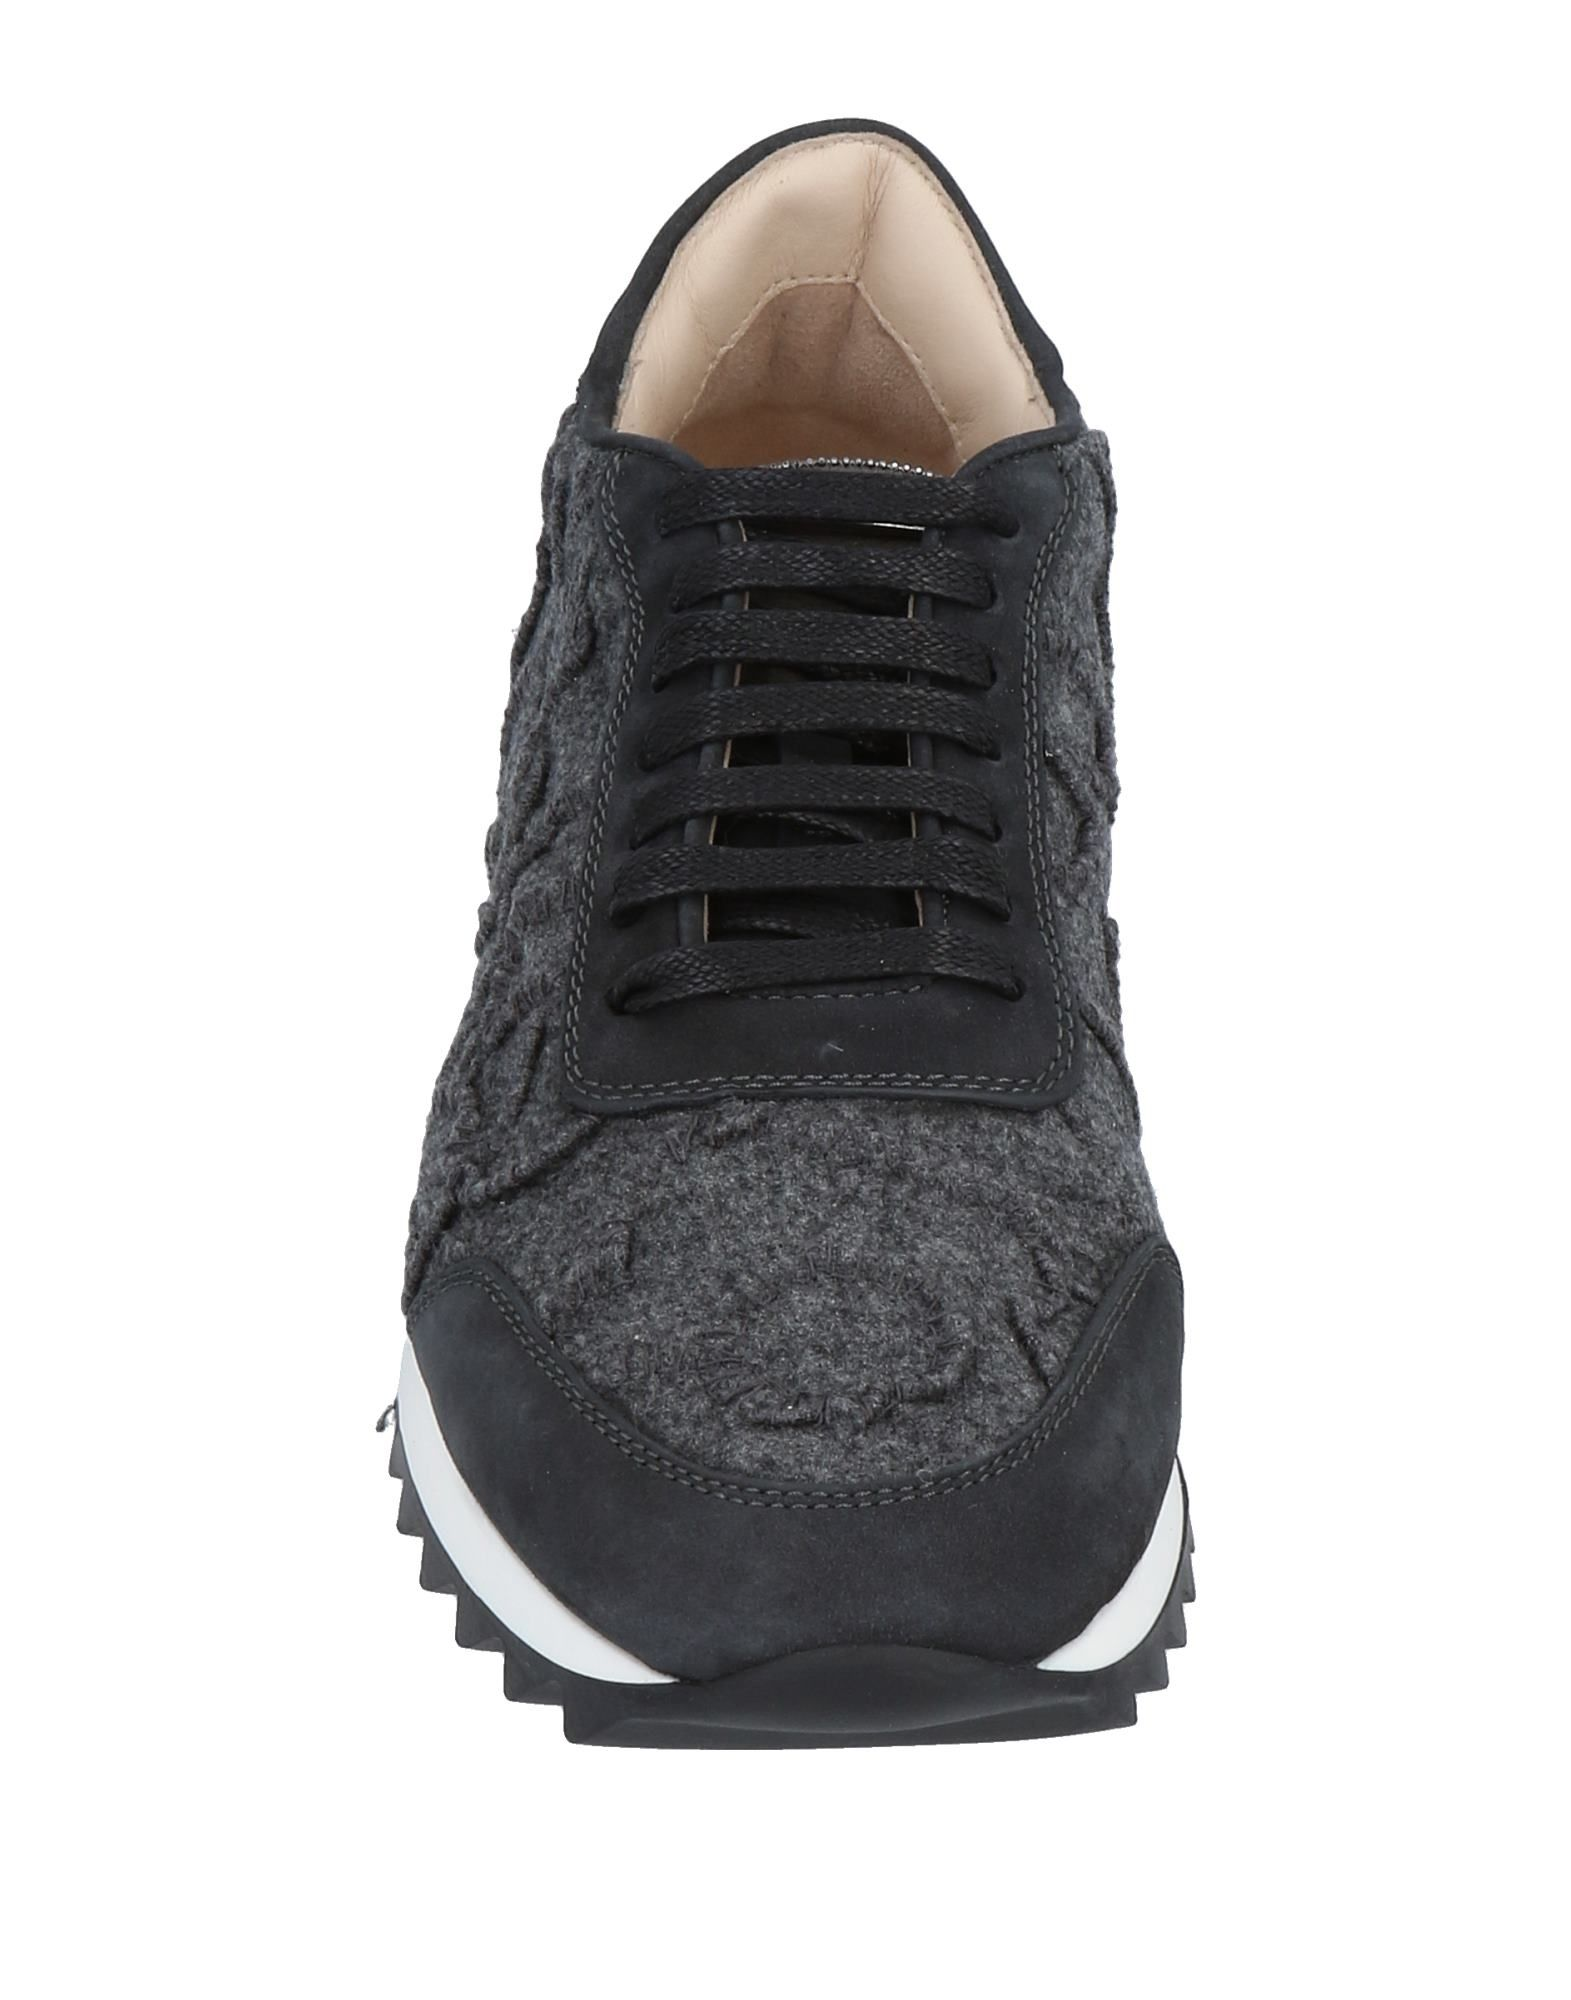 Fabiana Fabiana Fabiana Filippi Sneakers Damen  11487861AT Beliebte Schuhe b03488